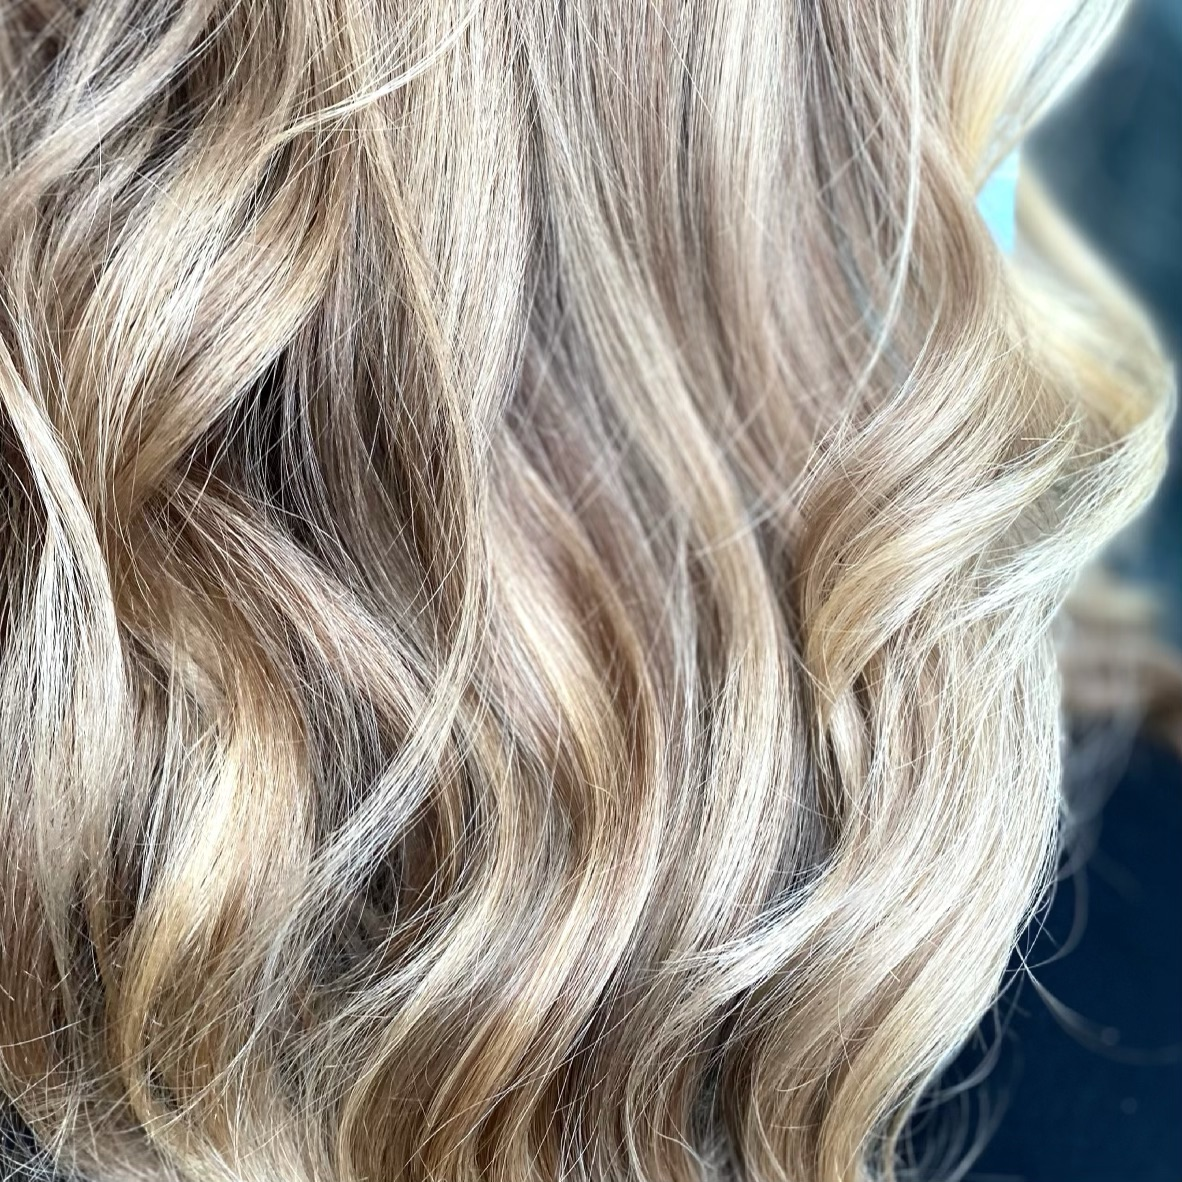 Up-close blonde highlights